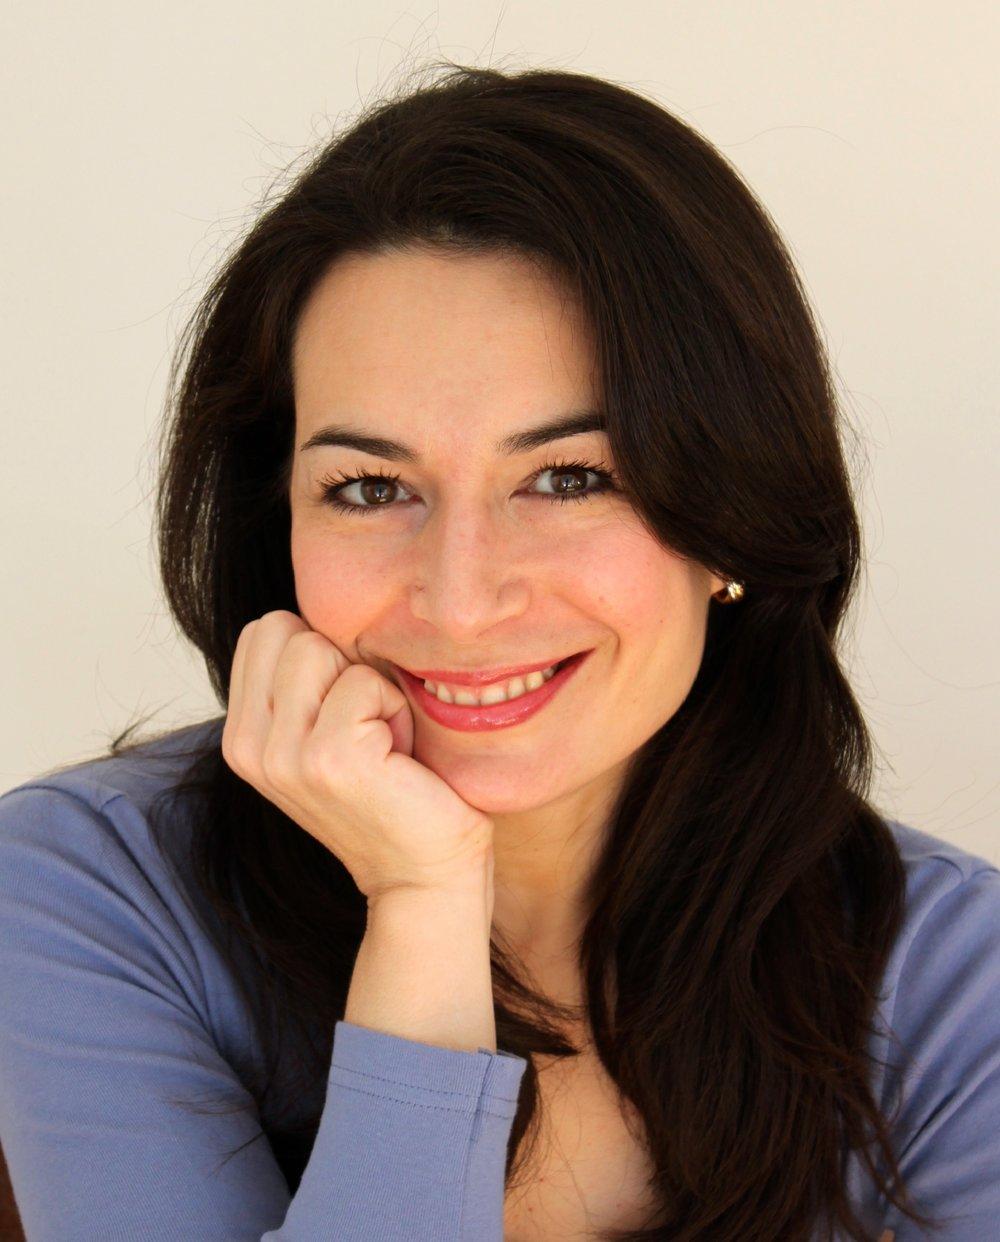 Dominique Stelling Daetwiler